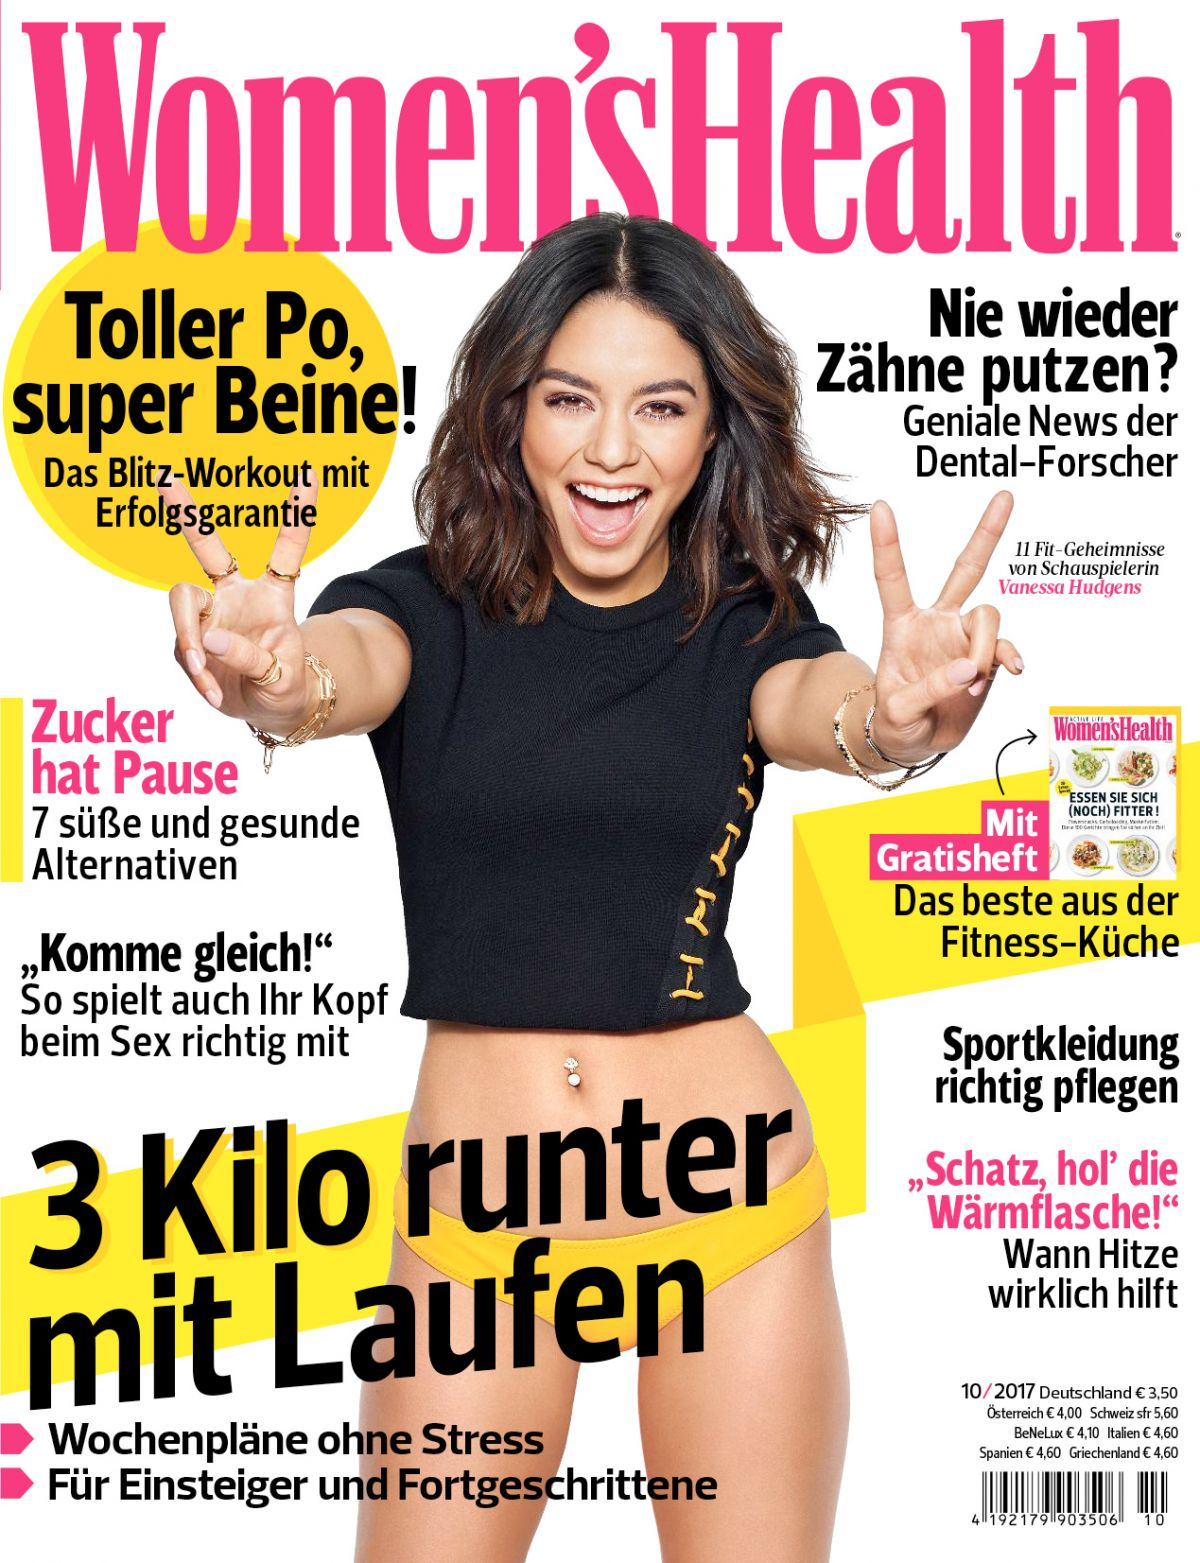 VANESSA HUDGENS in Women's Health Magazine, Germany Oktober 2017